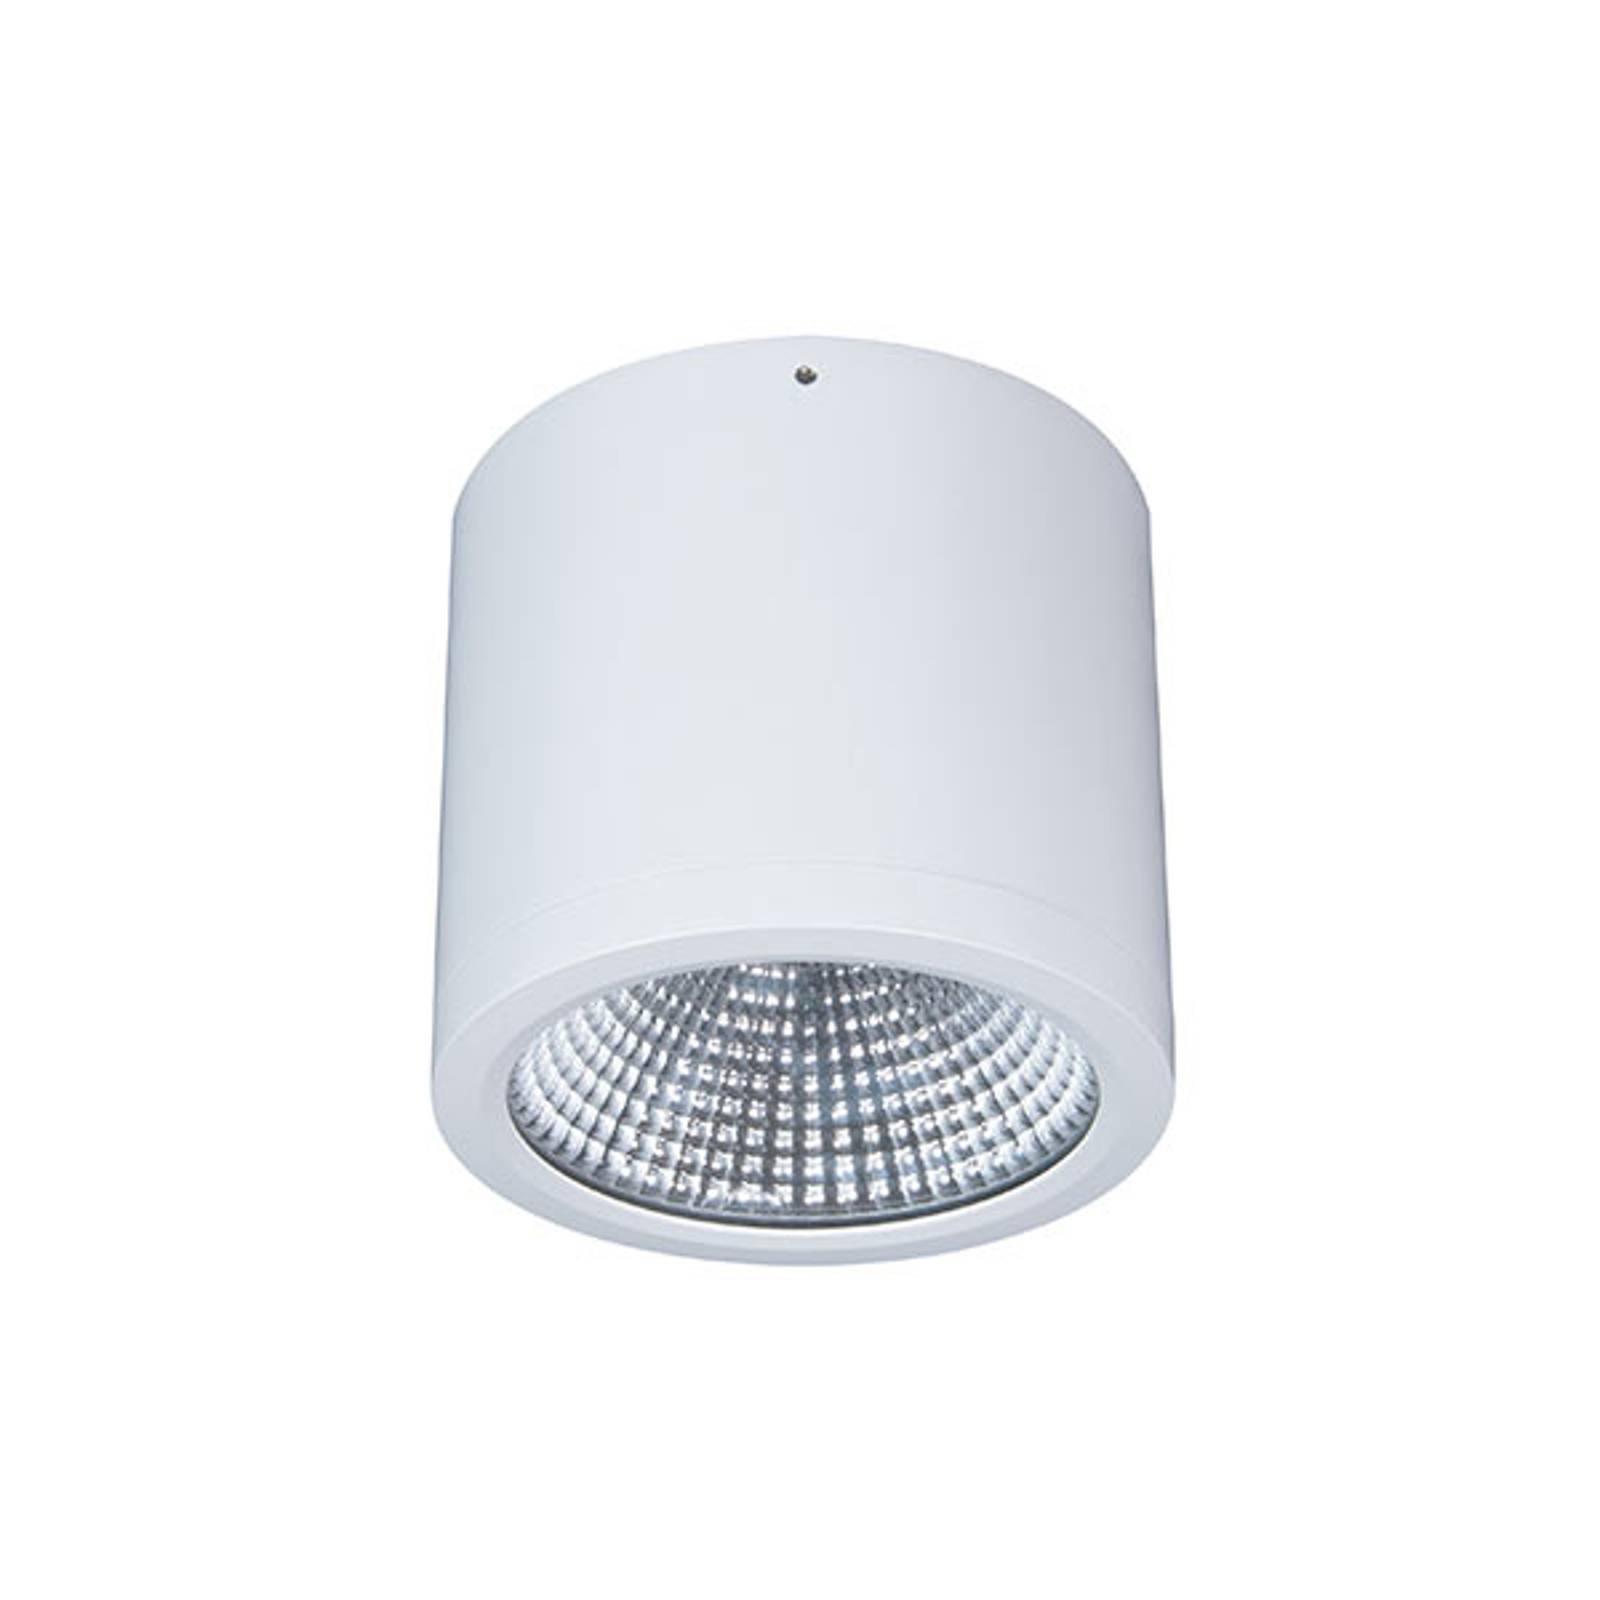 Downlight LED Button Mini 200 IP54 55° 24 W